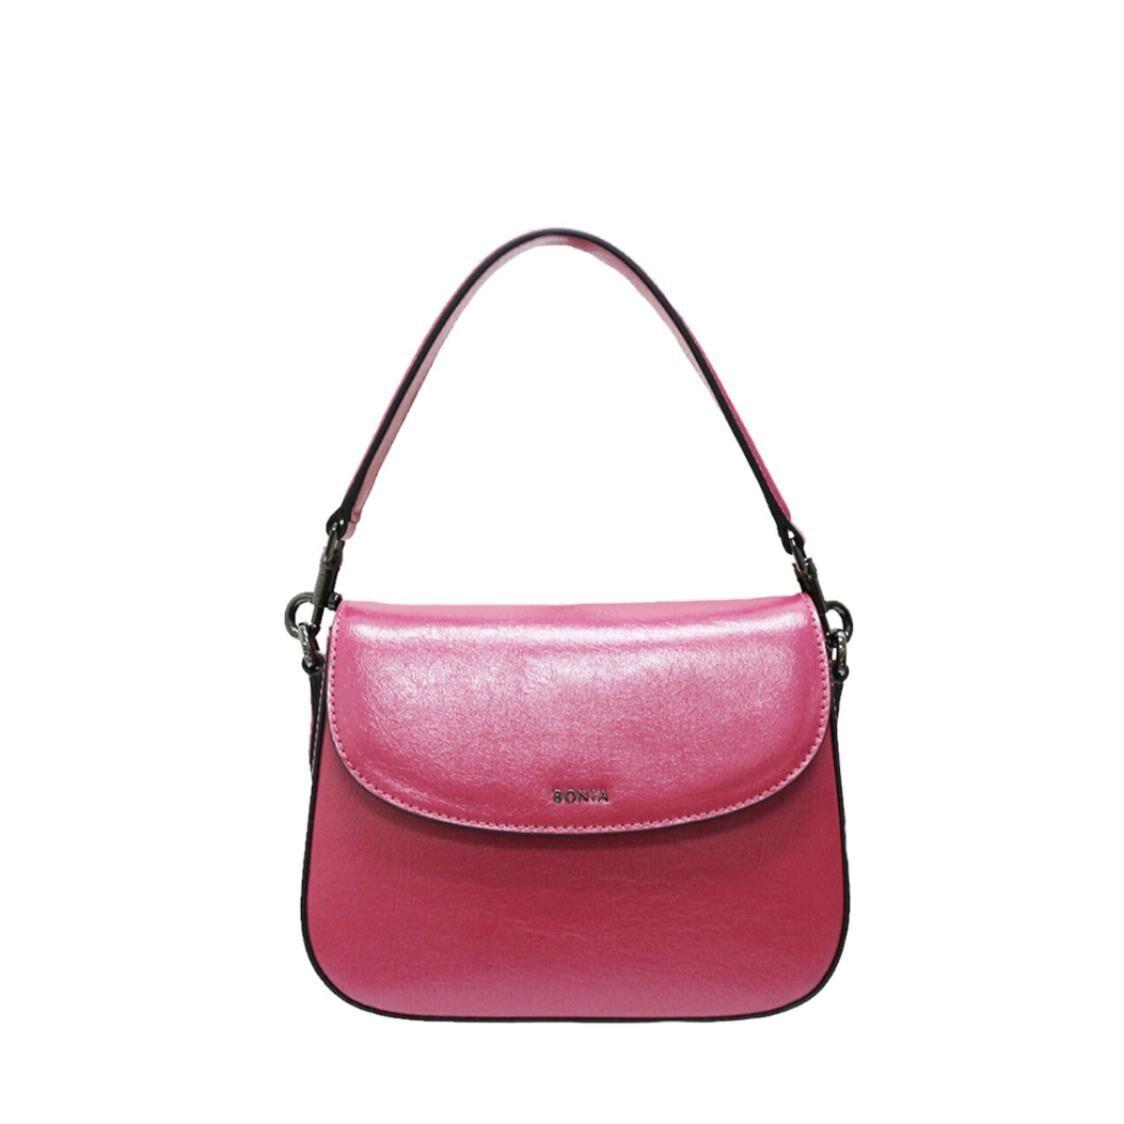 Bonia Small Crossbody Bag Fuchsia 801463-001-44